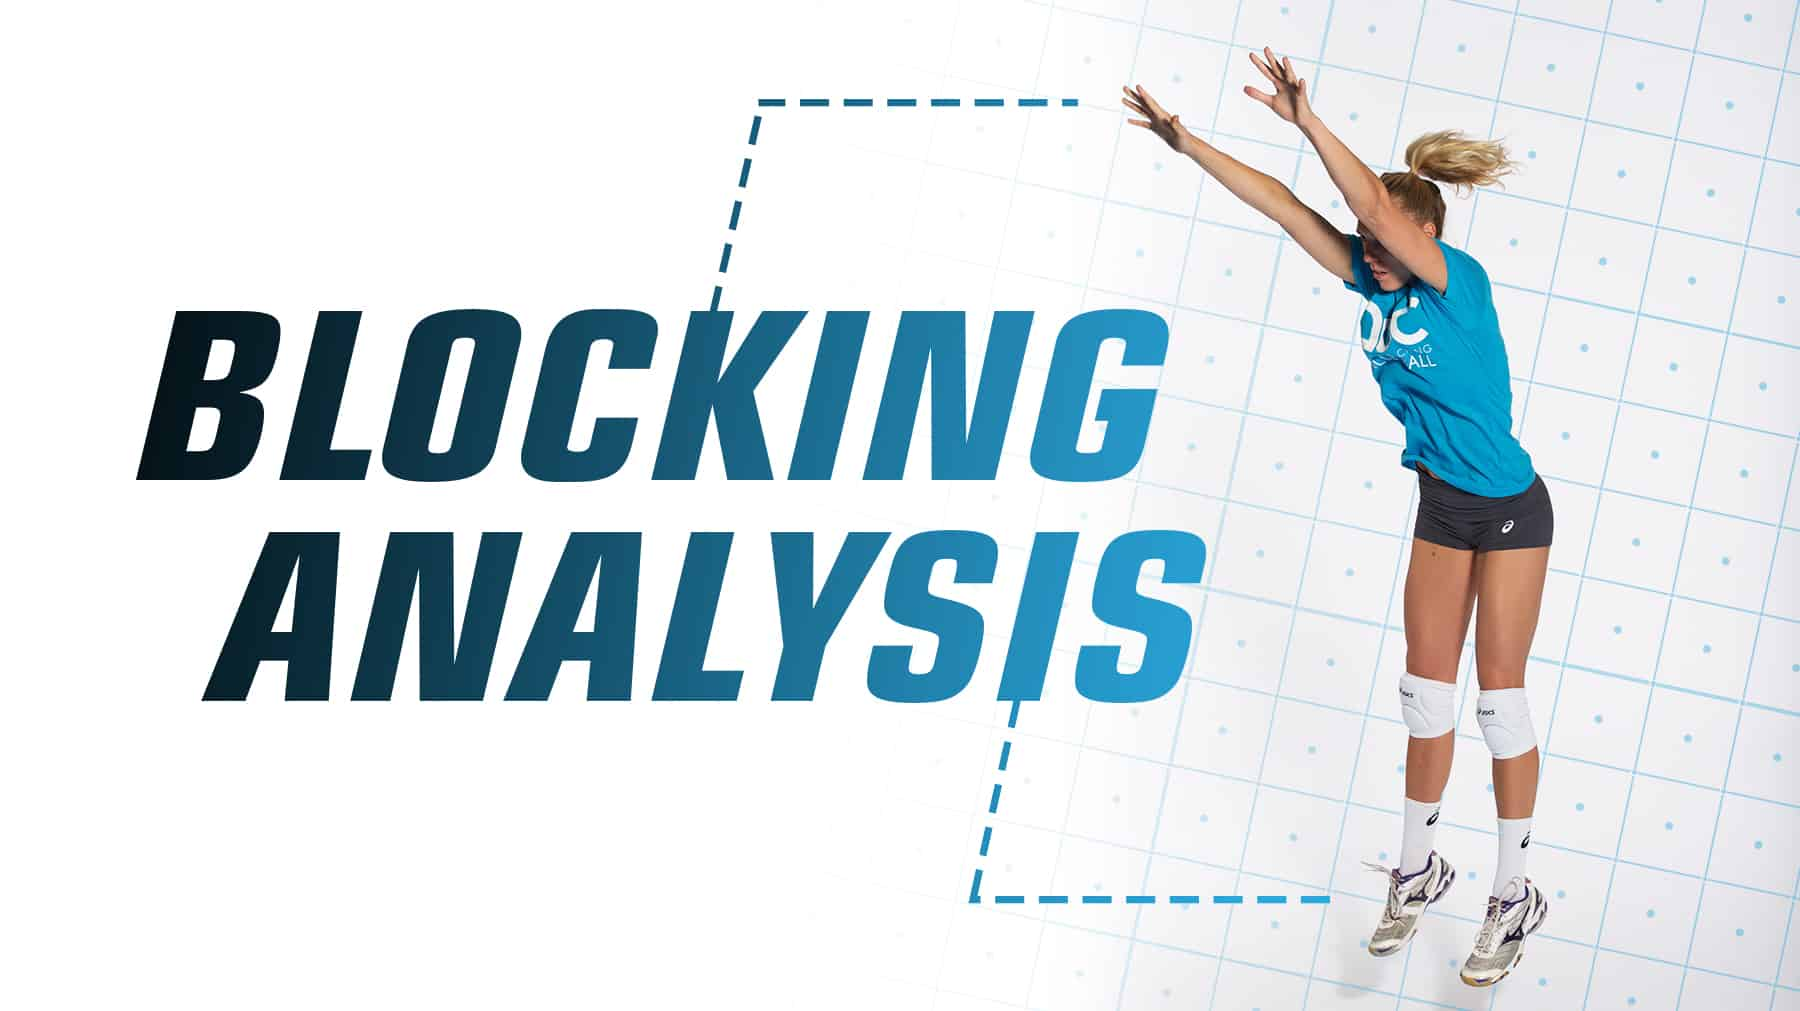 A Critical Analysis Of Blocking